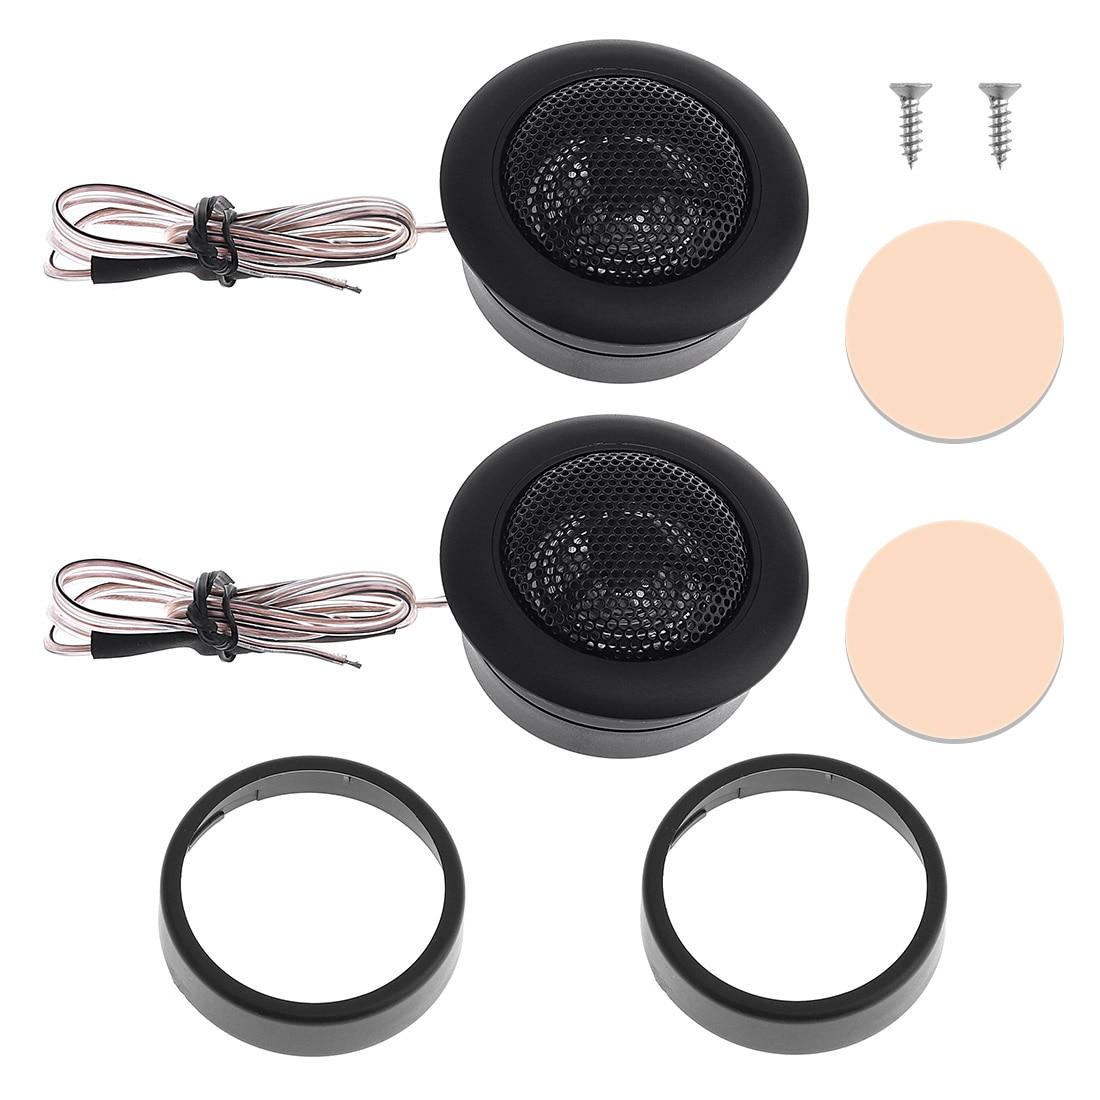 2Pcs/Lot 200W T120 Car Horn Dome Tweeter Car Speaker Audio Loudspeaker Car Stereo Speaker for Car Vehicle Sound Audio System